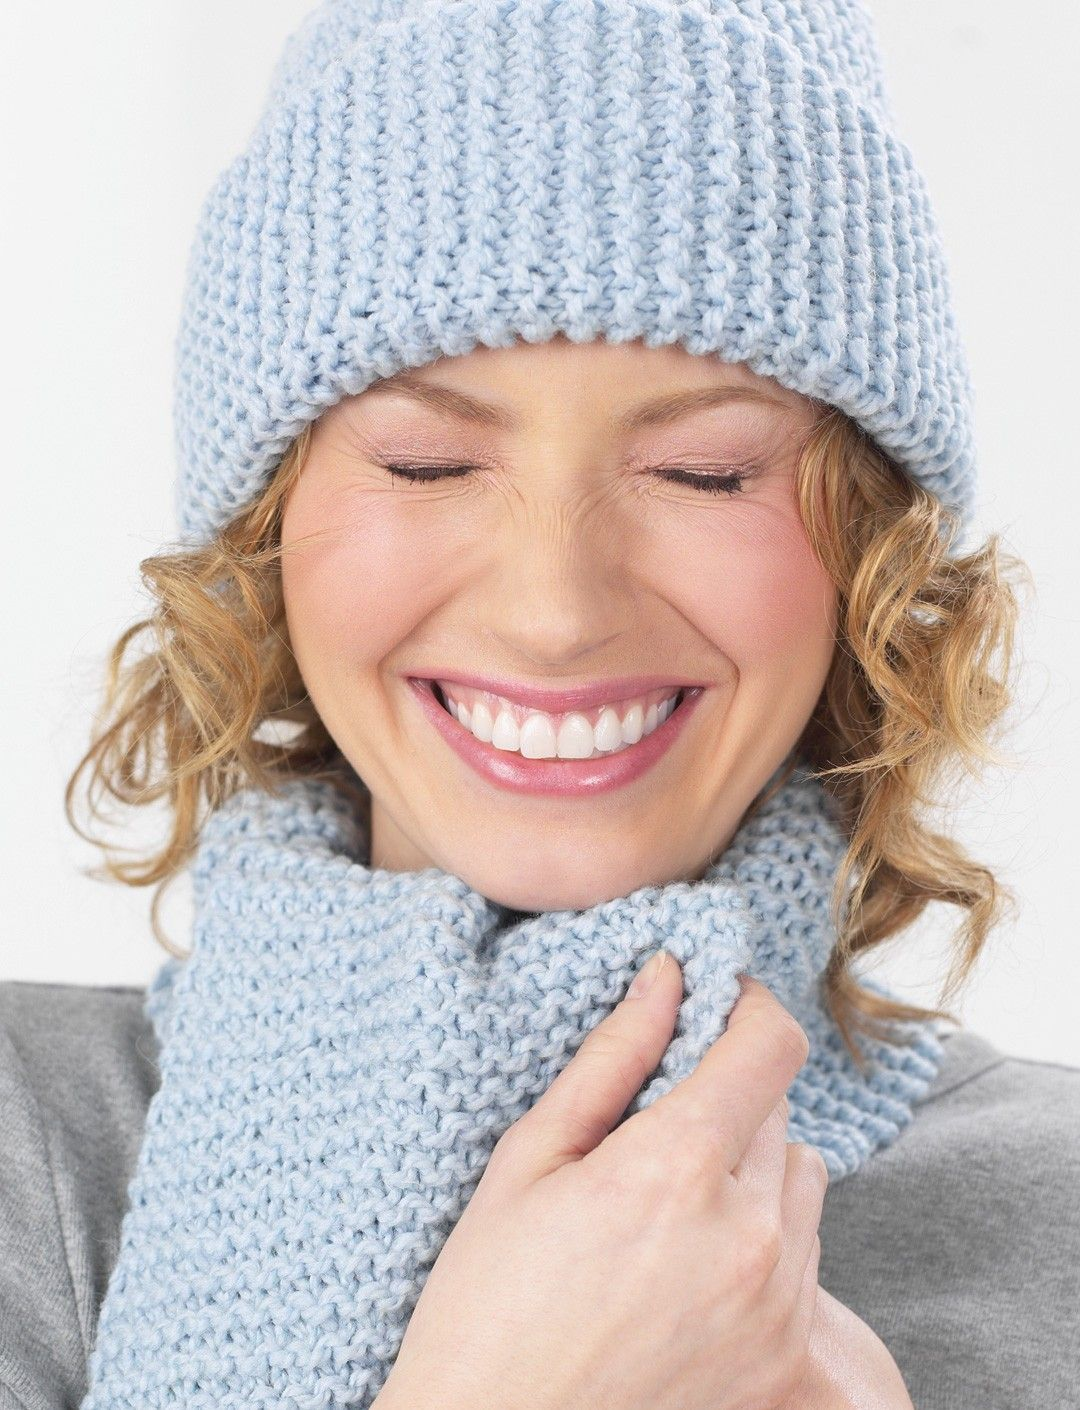 ec2b8aa51fd Yarnspirations.com - Patons Garter Stitch Sideways Hat - Patterns ...